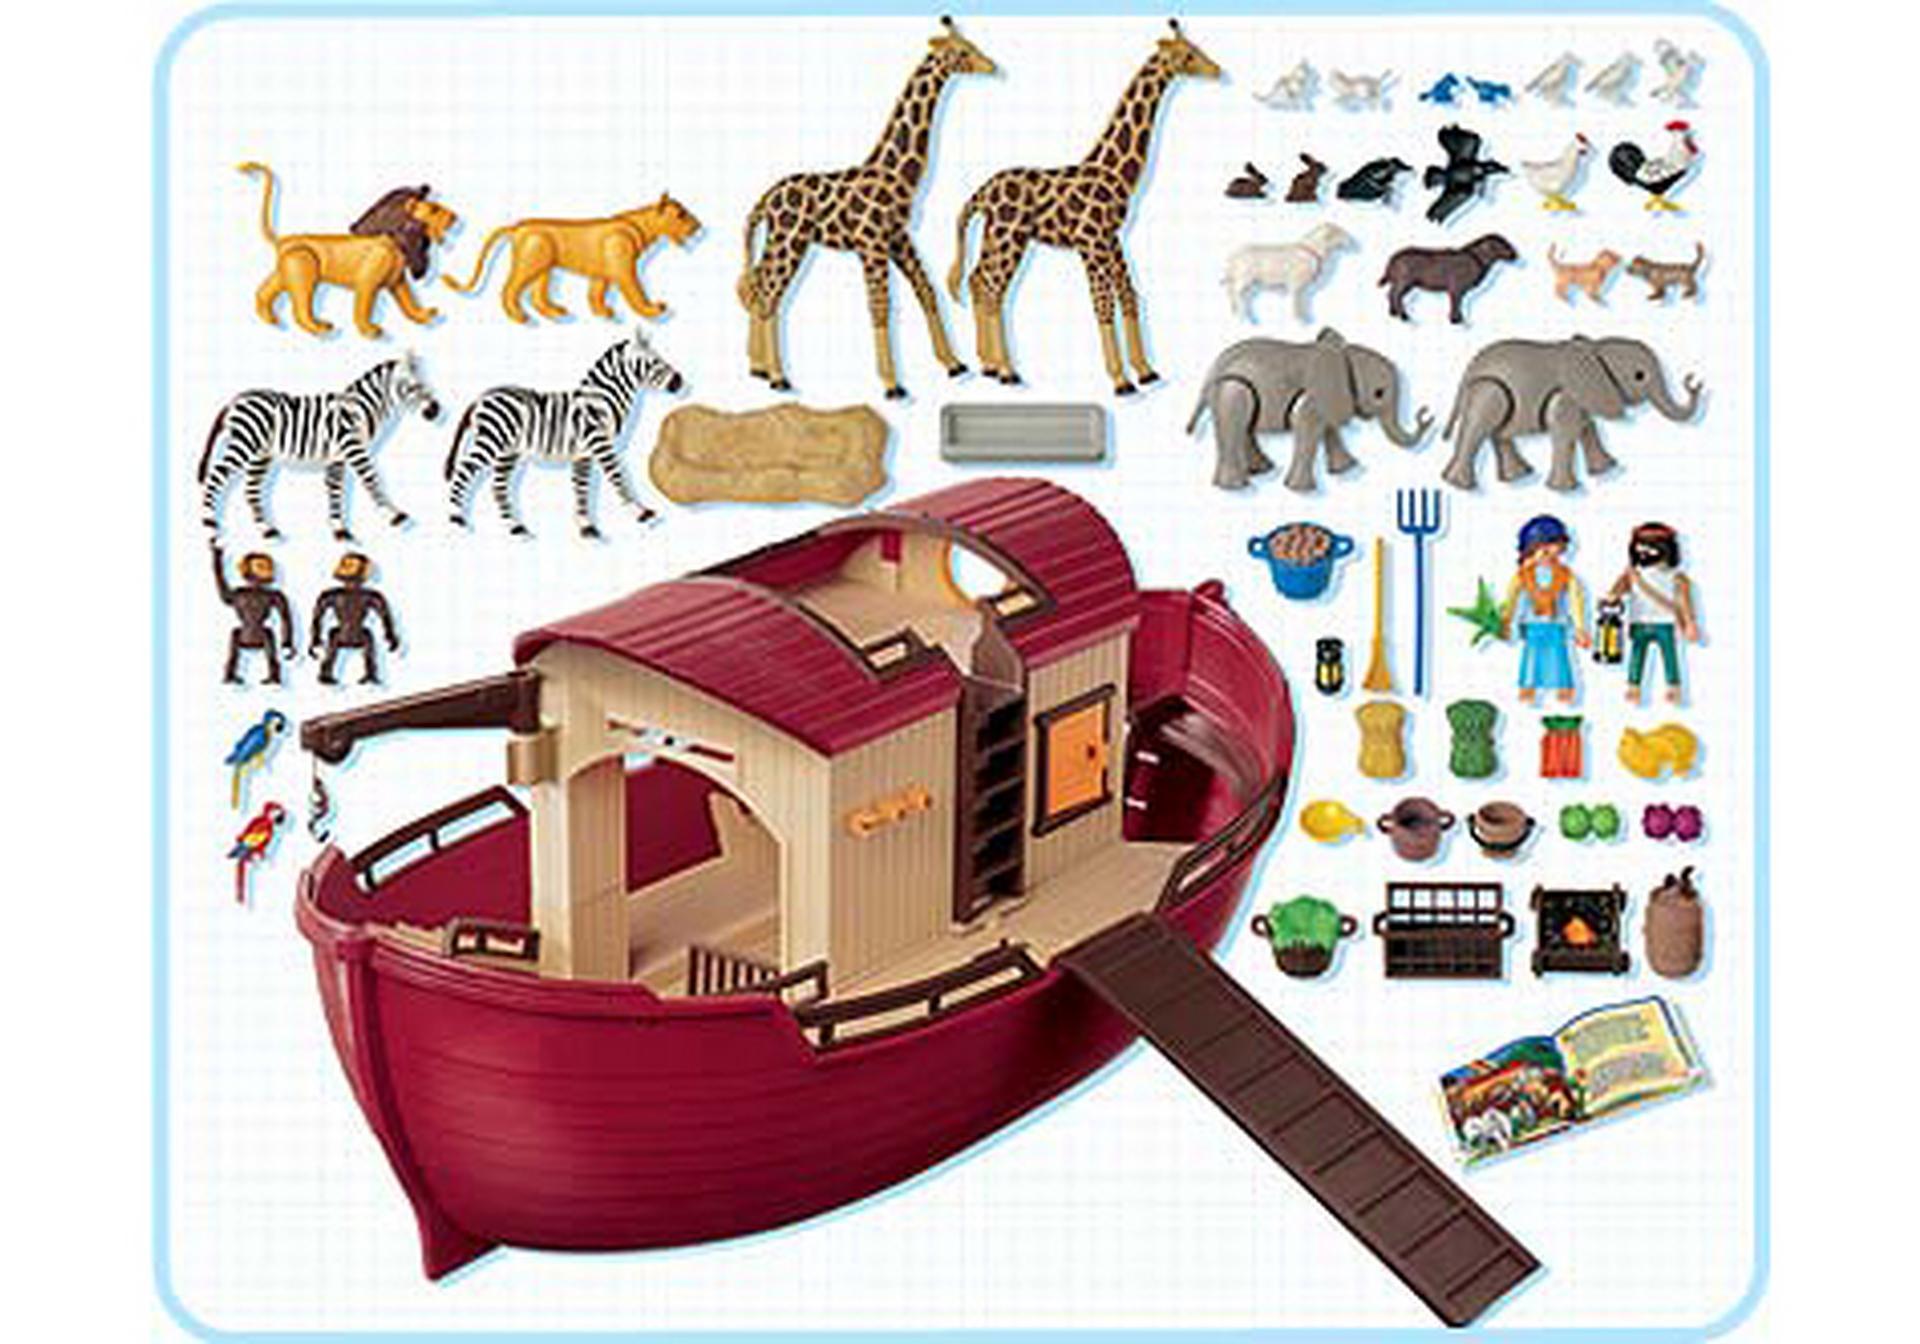 arche noah 3255 c playmobil deutschland. Black Bedroom Furniture Sets. Home Design Ideas